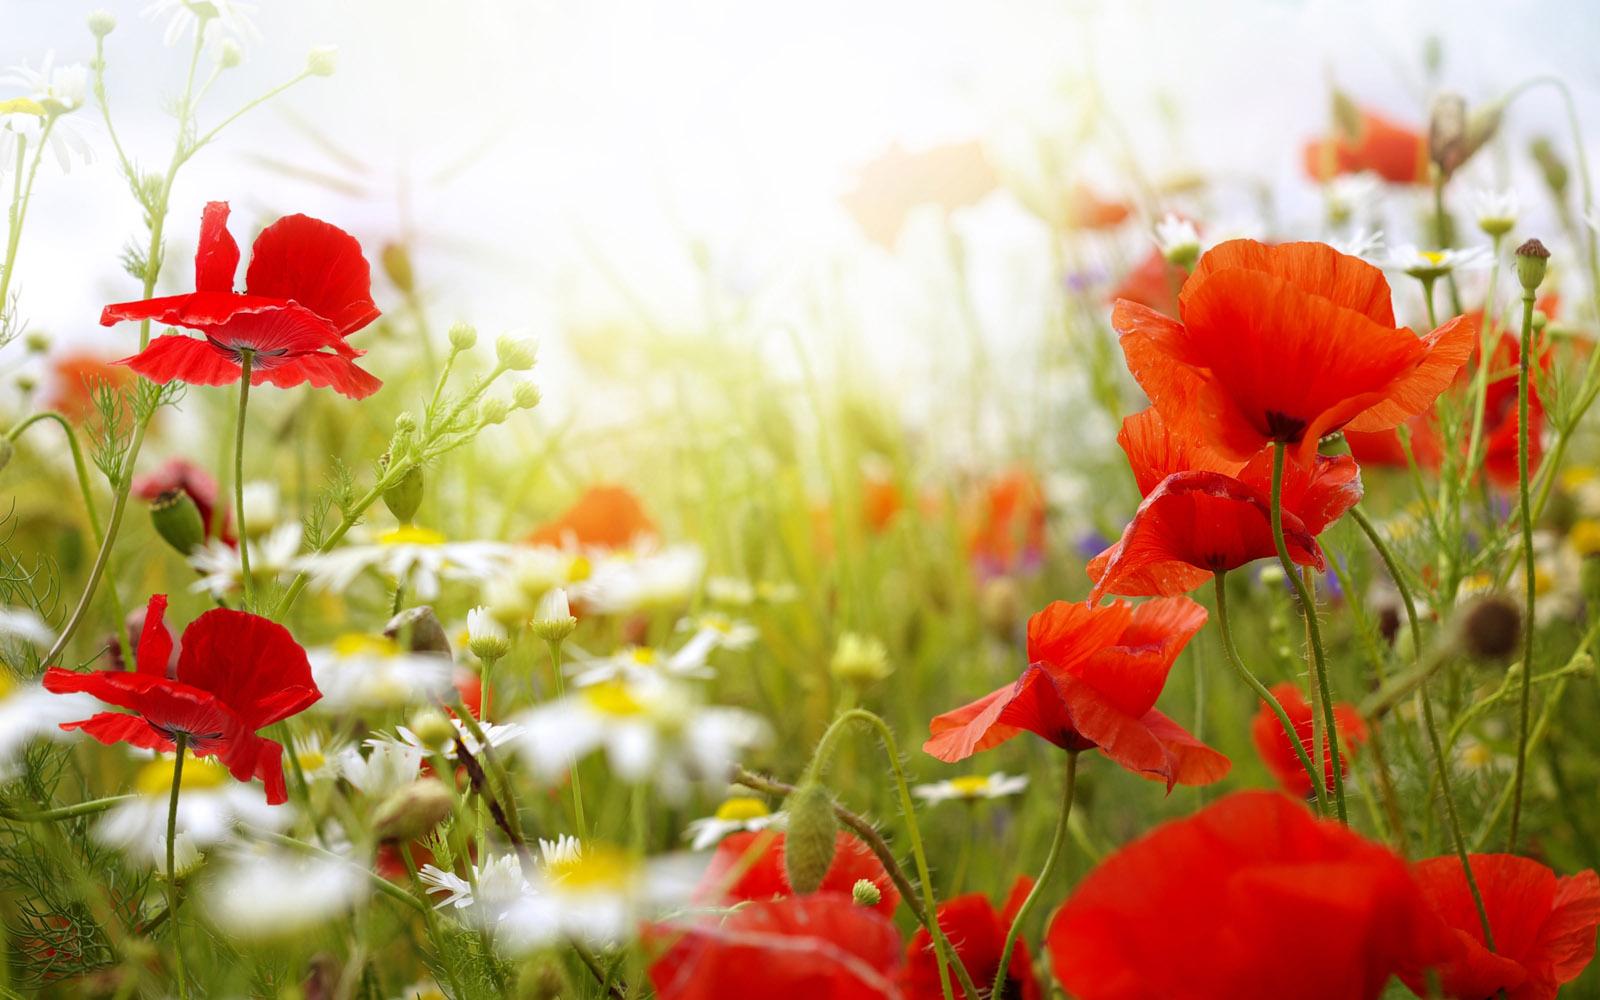 Spring Flowers Wallpaper 1600x1000 pixel Popular HD Wallpaper 20821 1600x1000